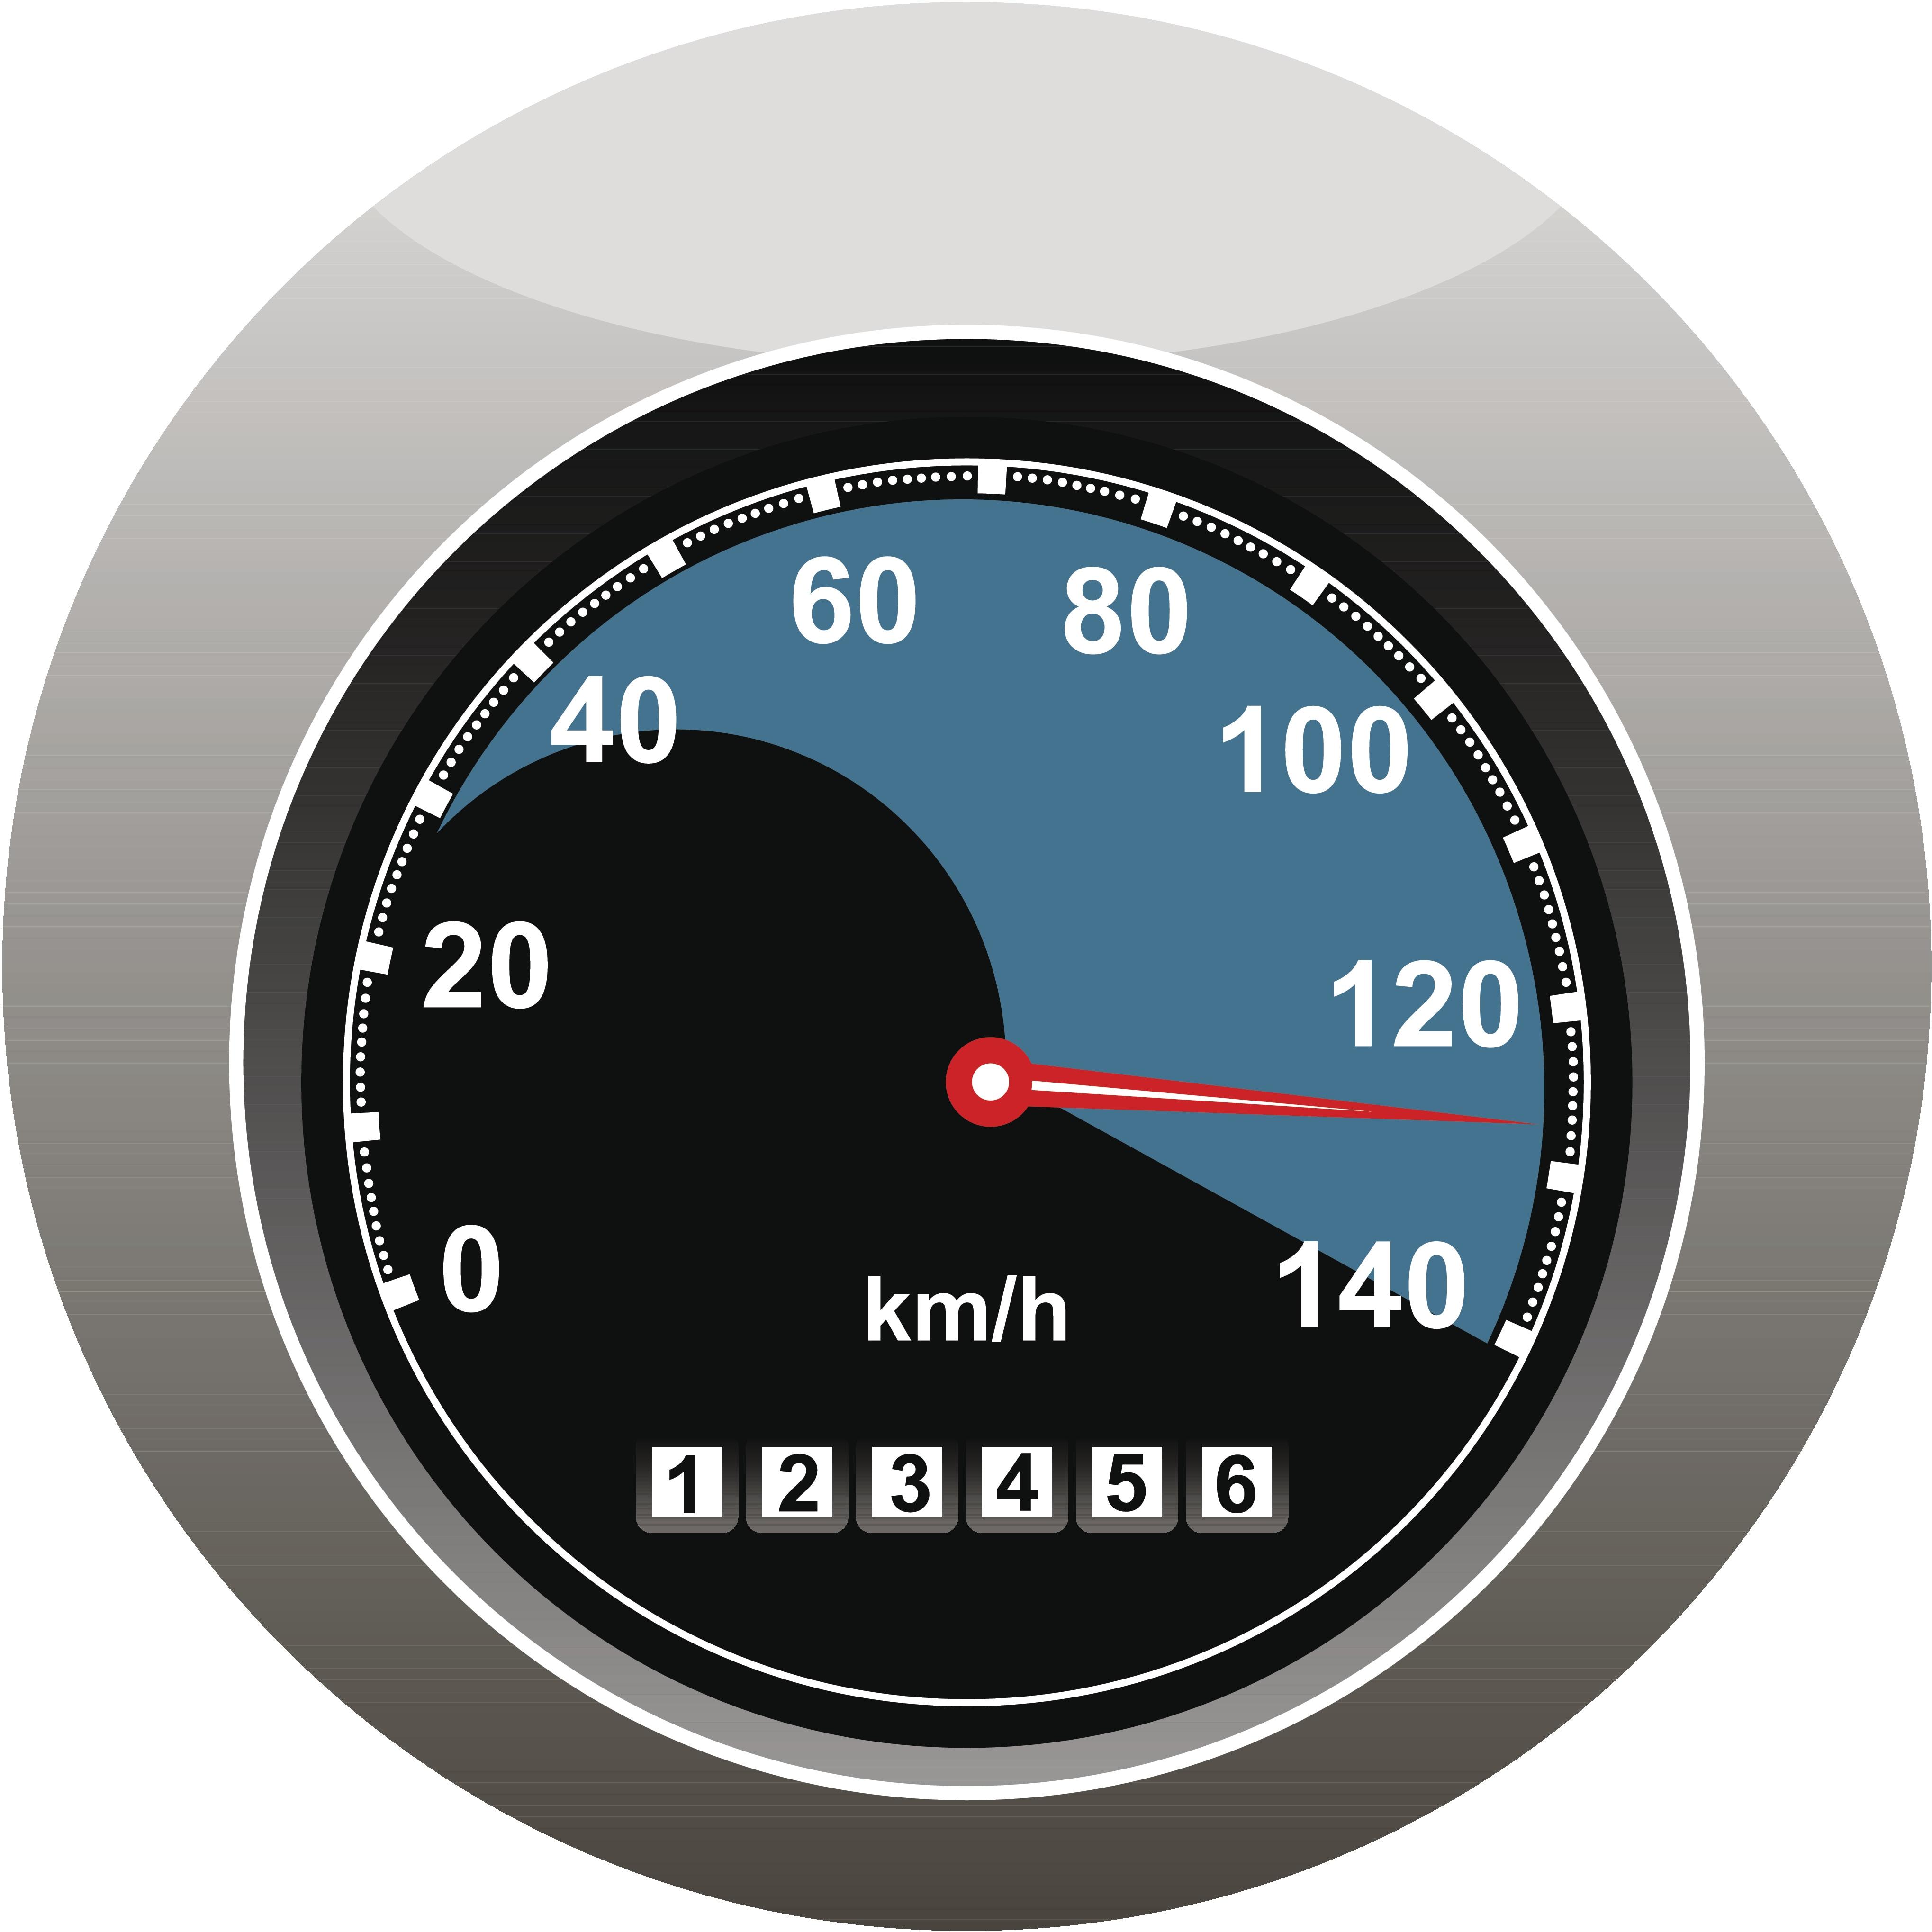 Nissan Dealership Metric Speedometer Mockup Image - Port City Nissan